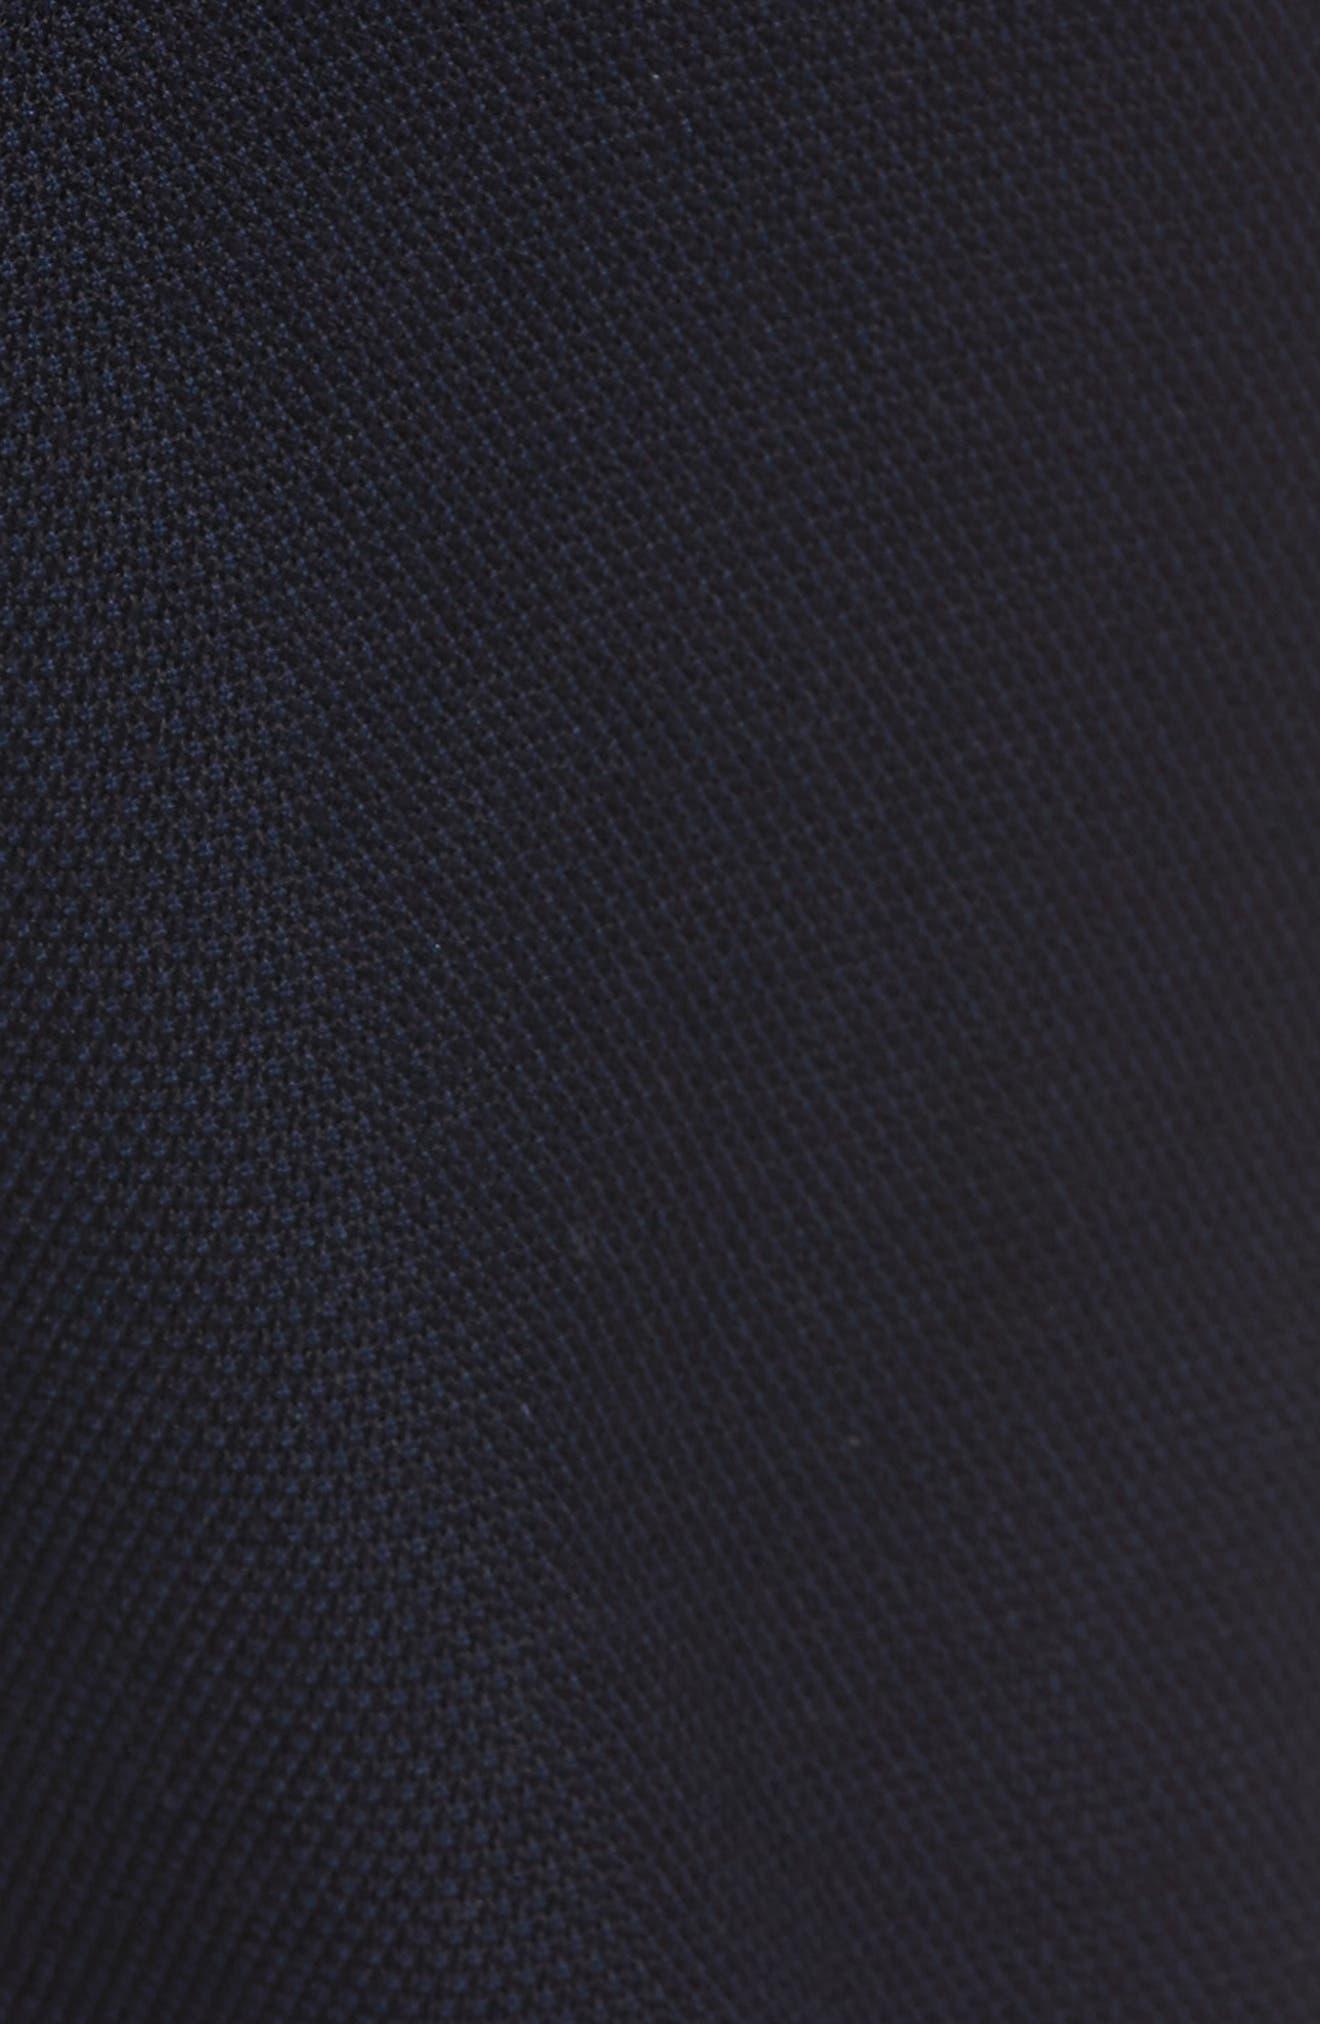 Delaware Slim Microtexture Five Pocket Pants,                             Alternate thumbnail 5, color,                             410